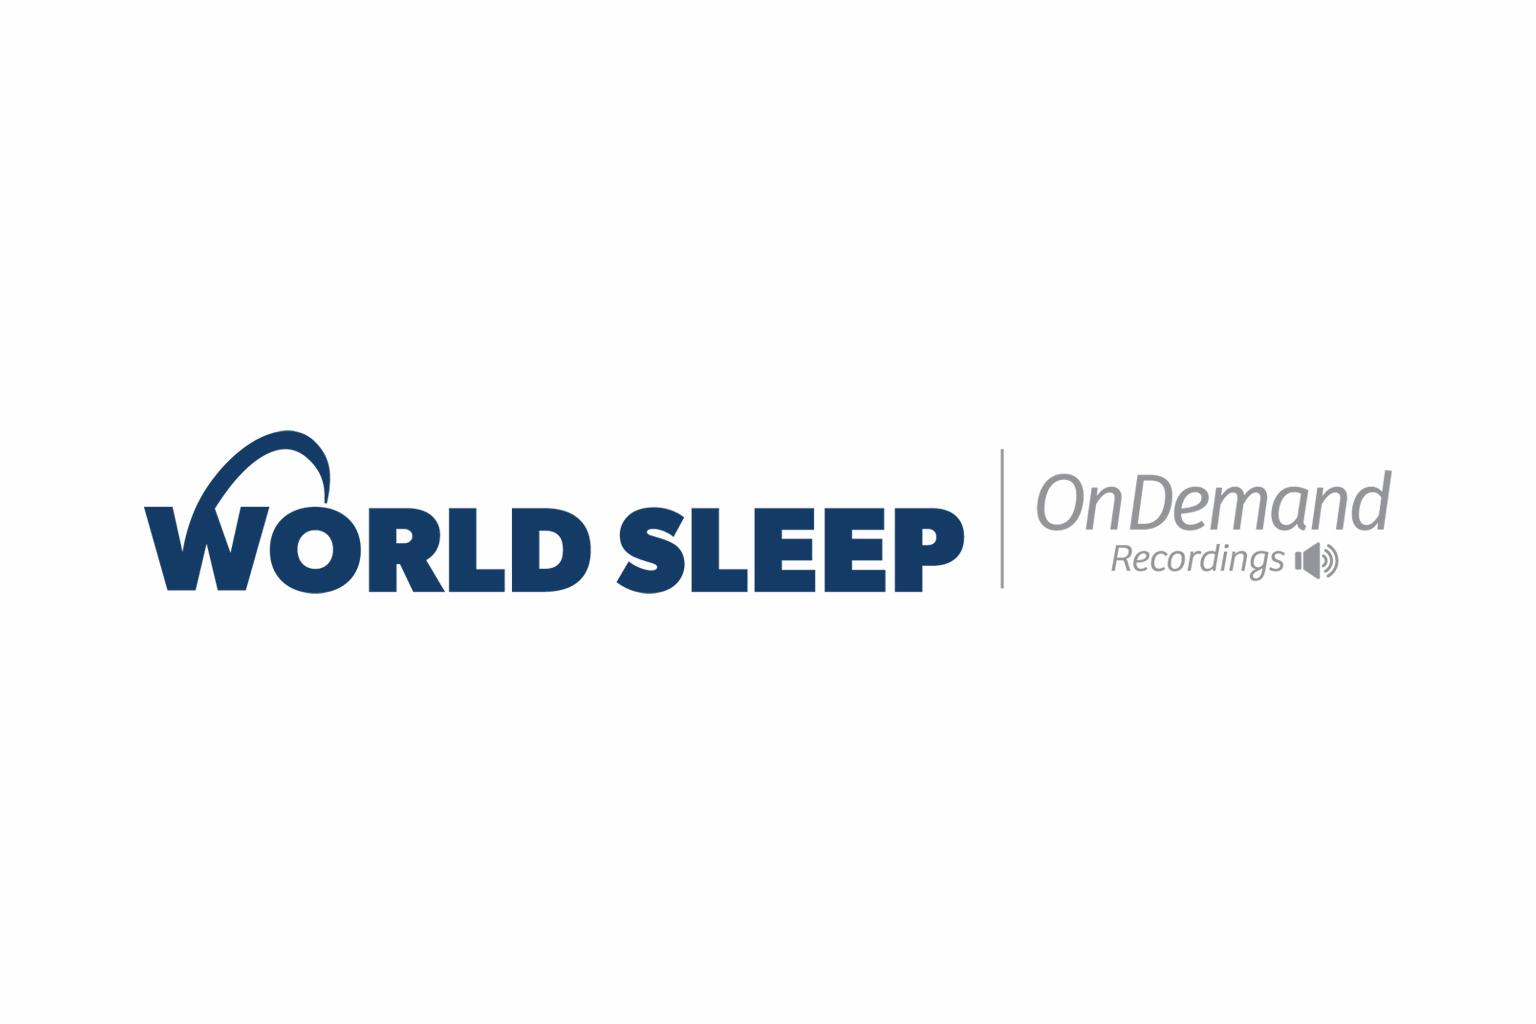 World Sleep OnDemand logo